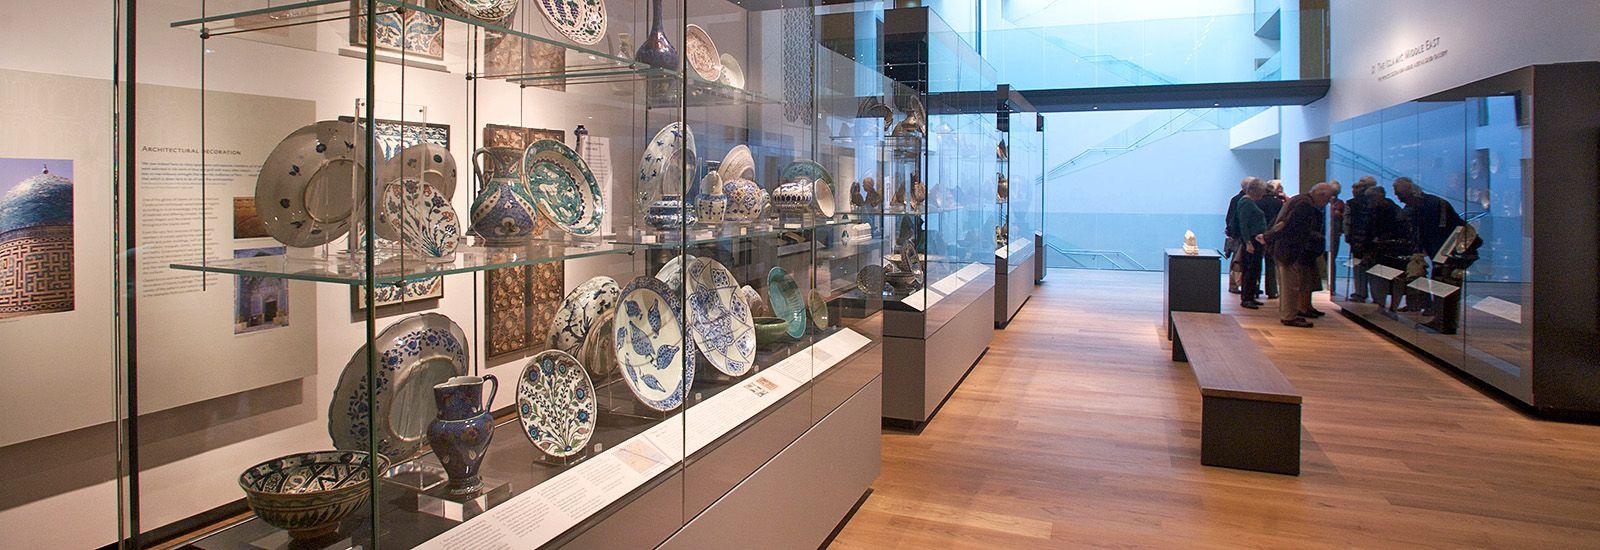 A display of ceramics in the Ashmolean